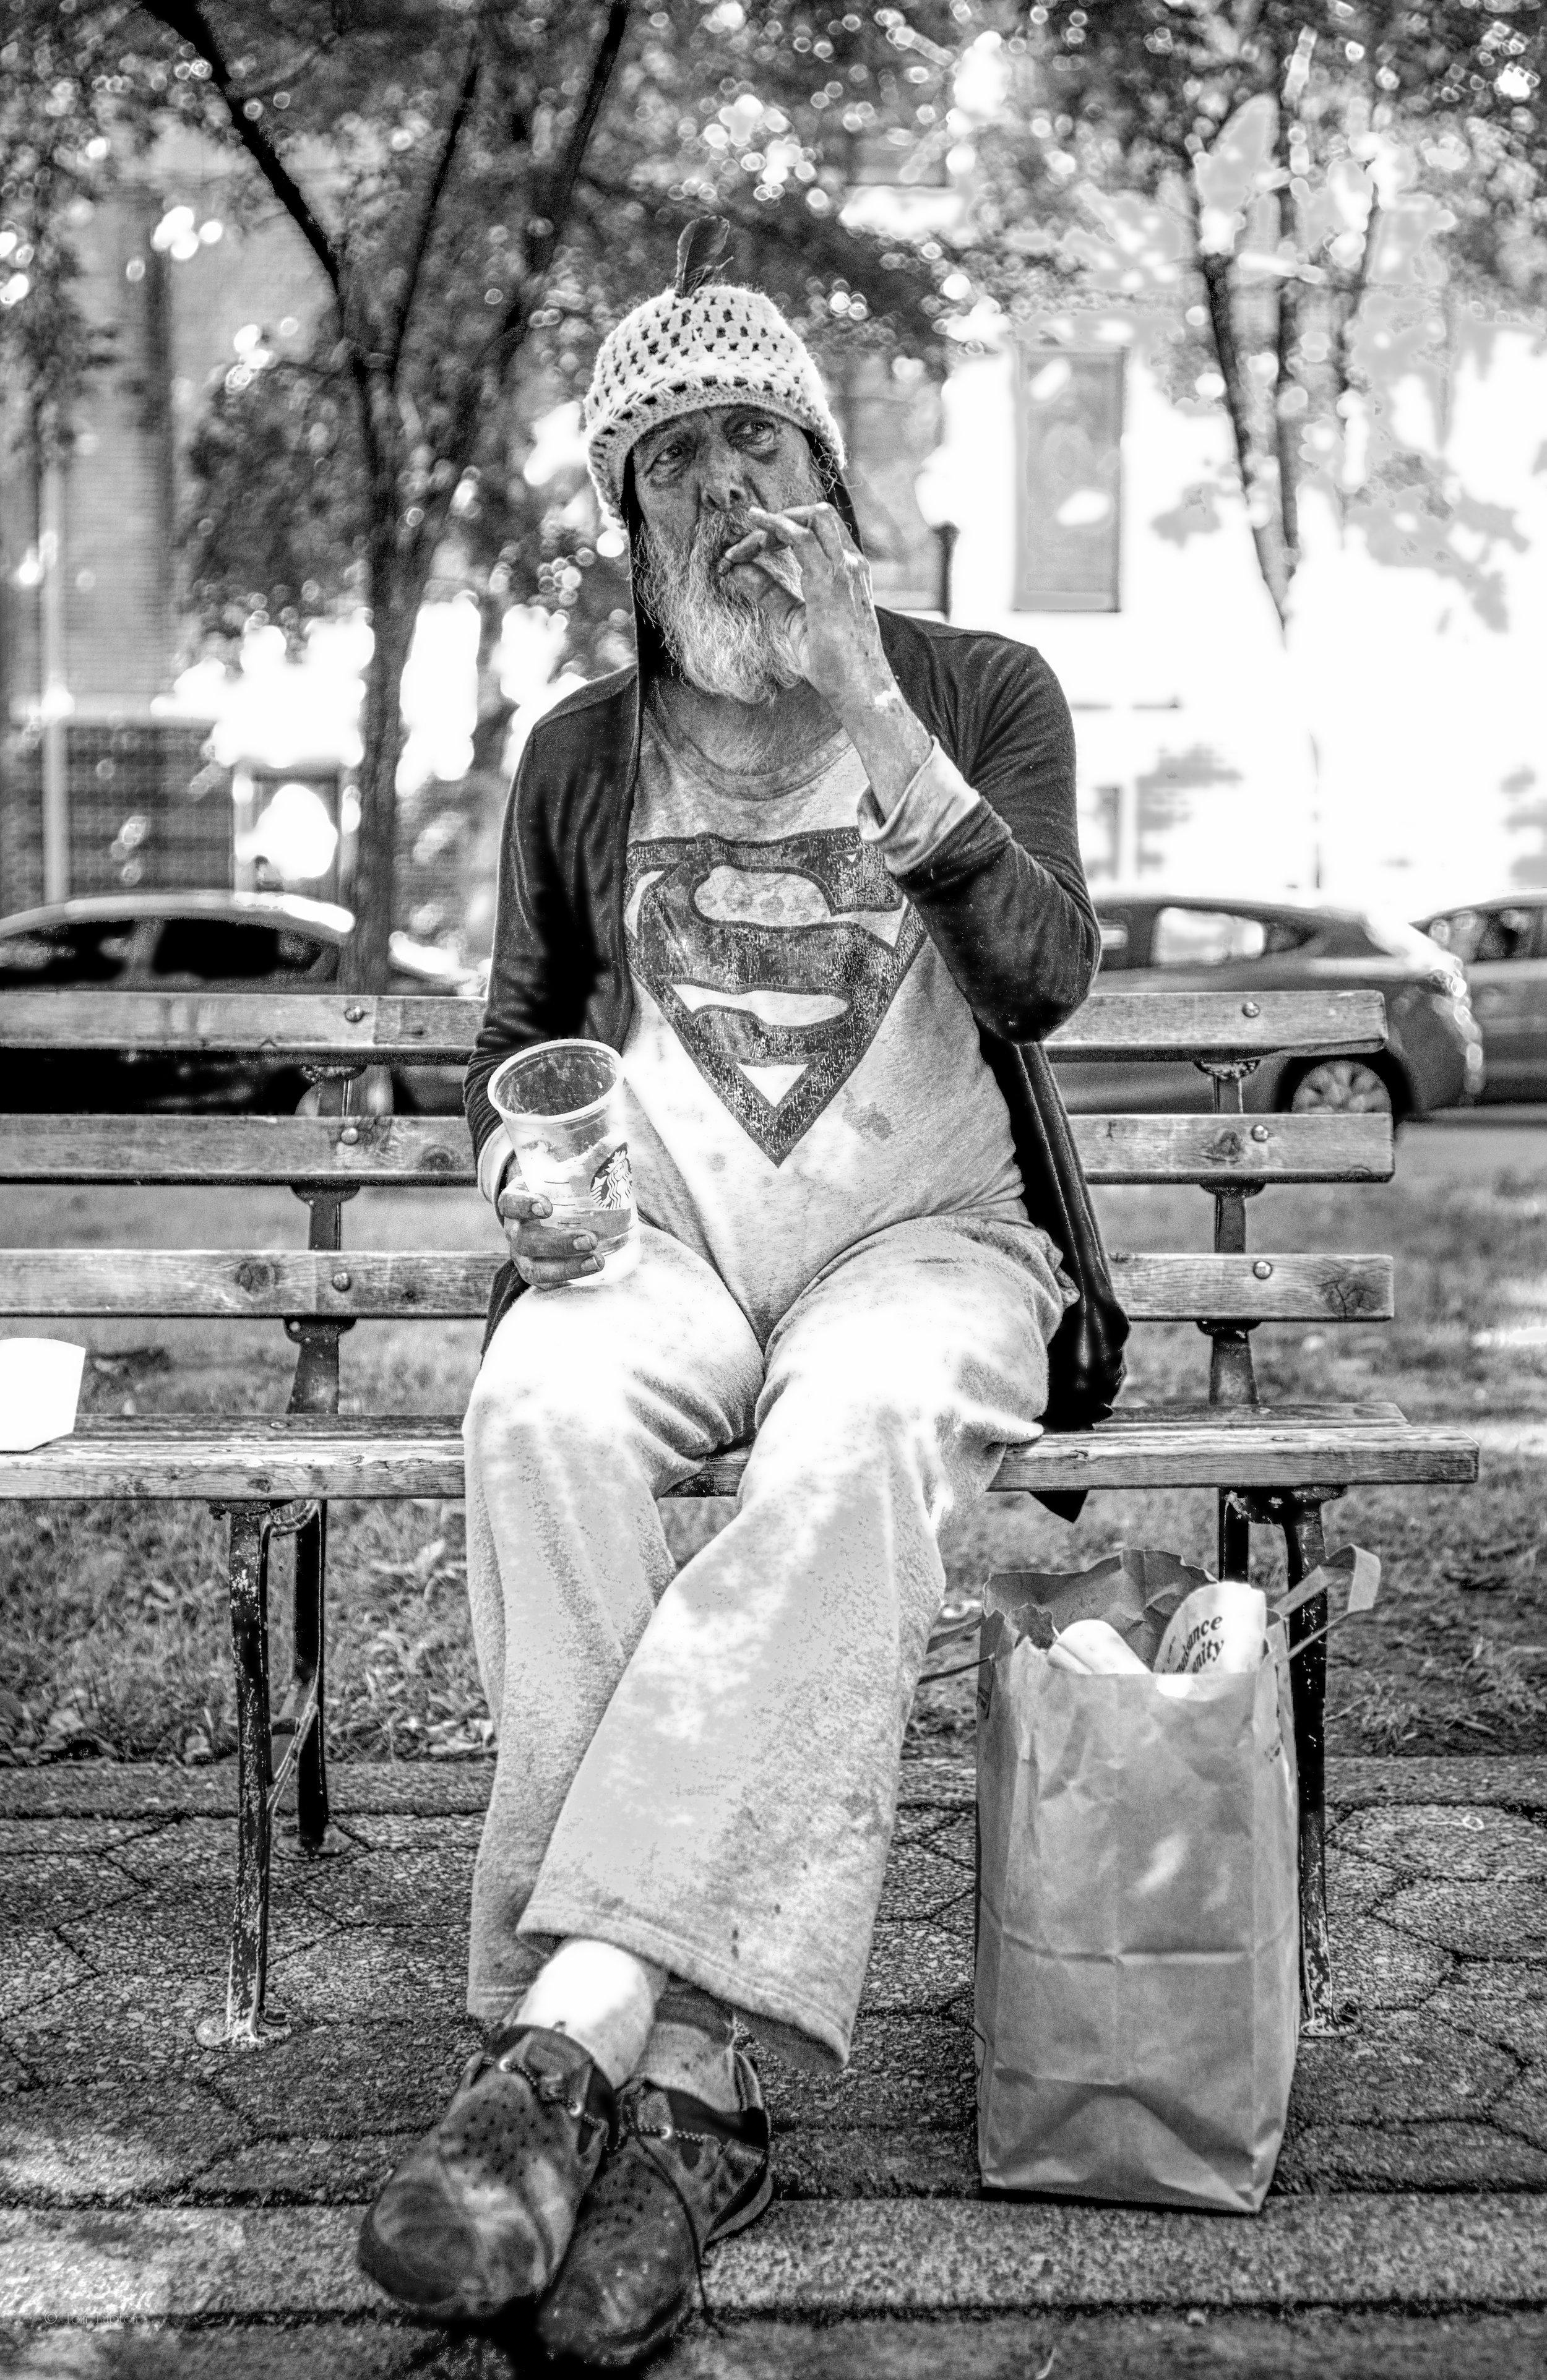 Tom_Lupton_Photography_Superman.jpg